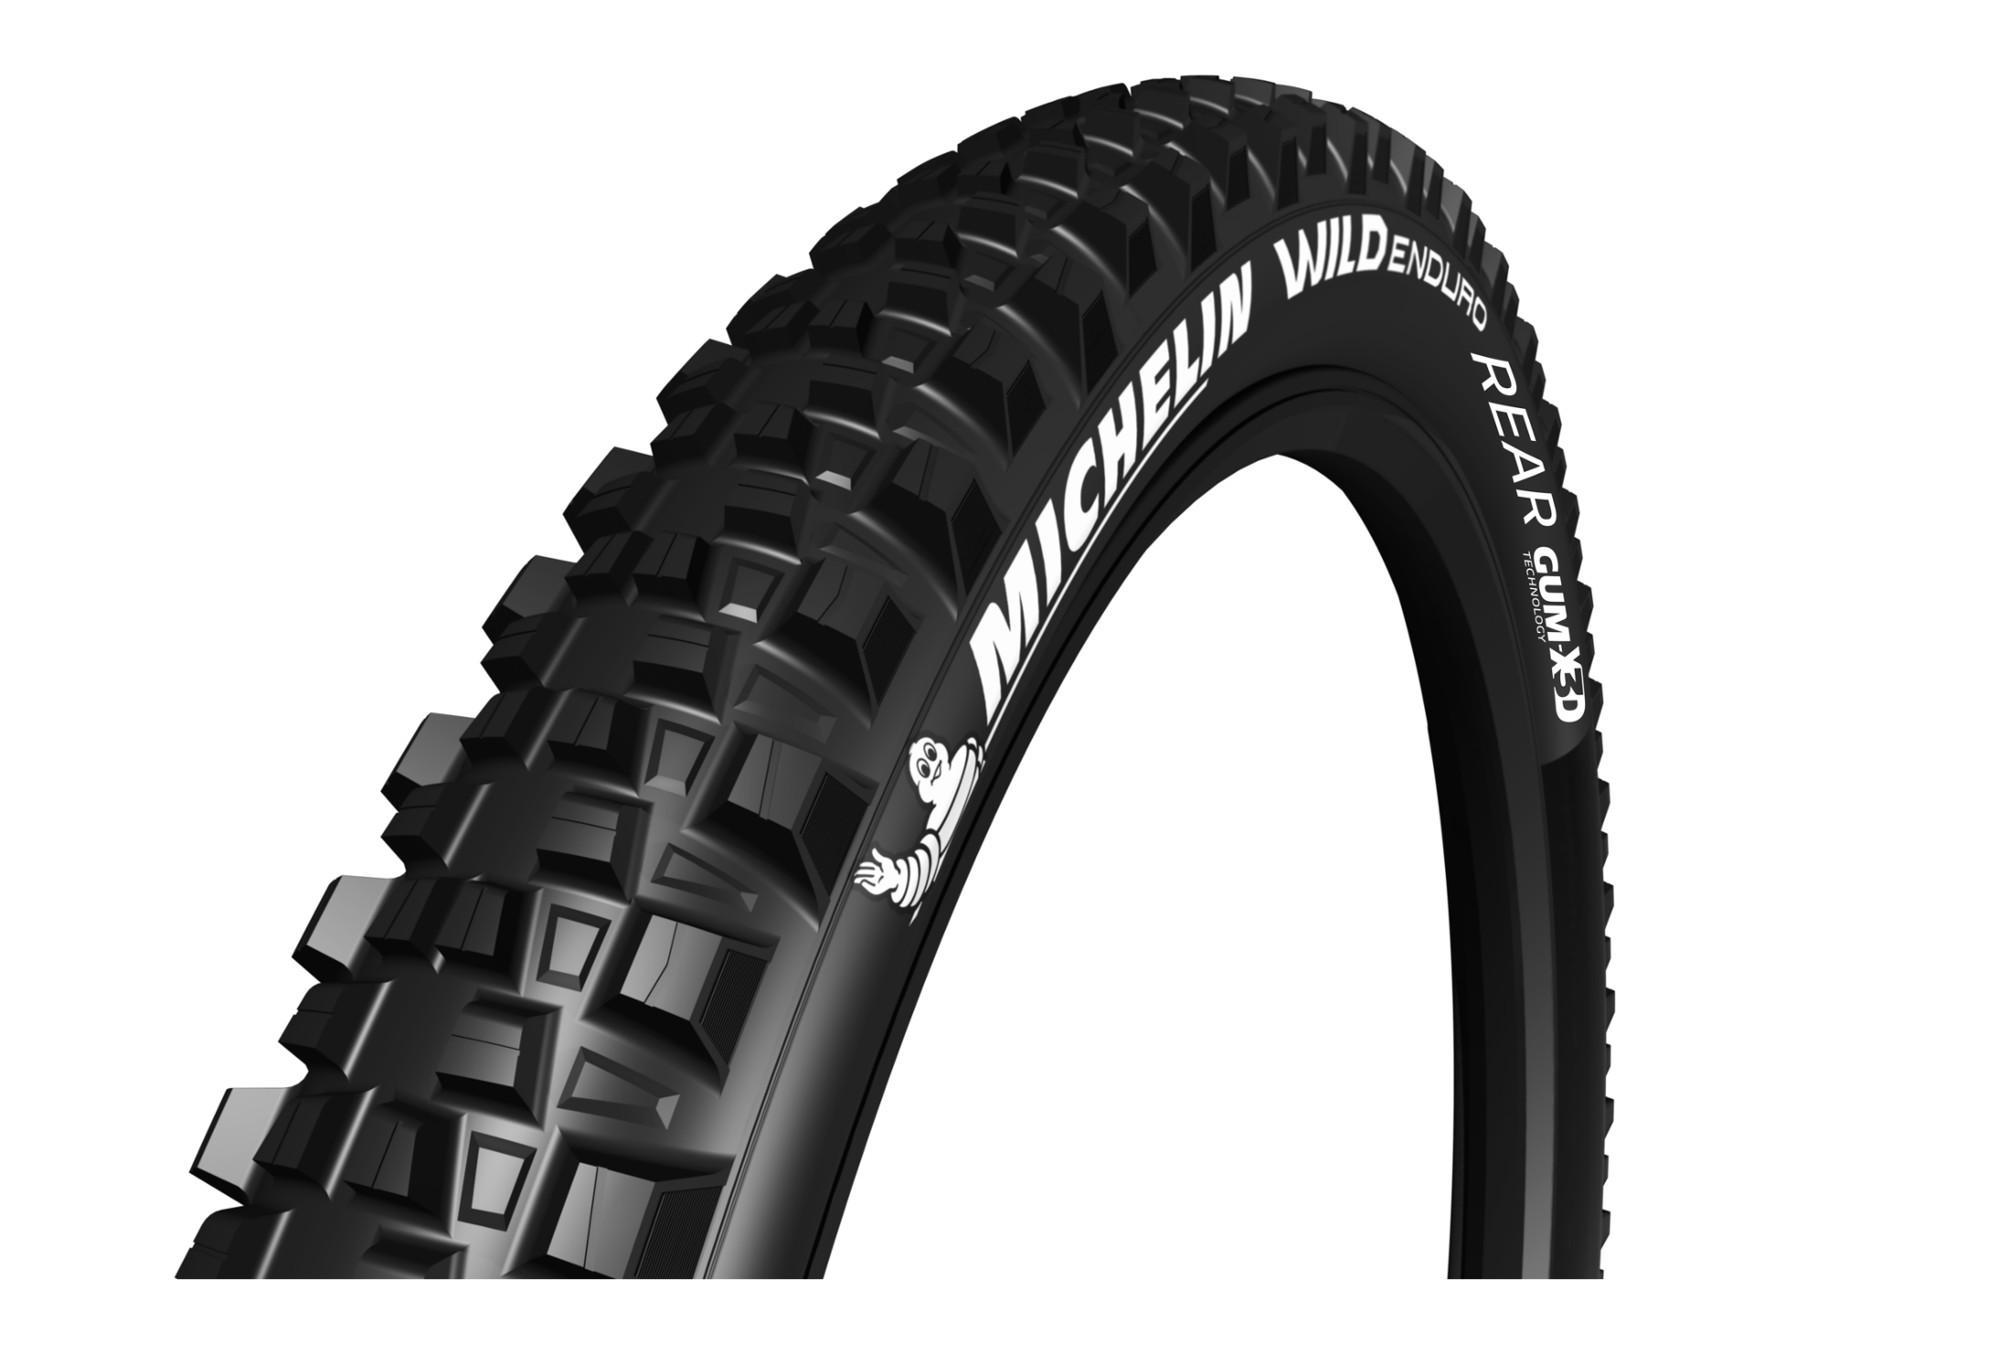 Michelin Wild Enduro Rear Gum-X TS 27.5x2.40 Plegable